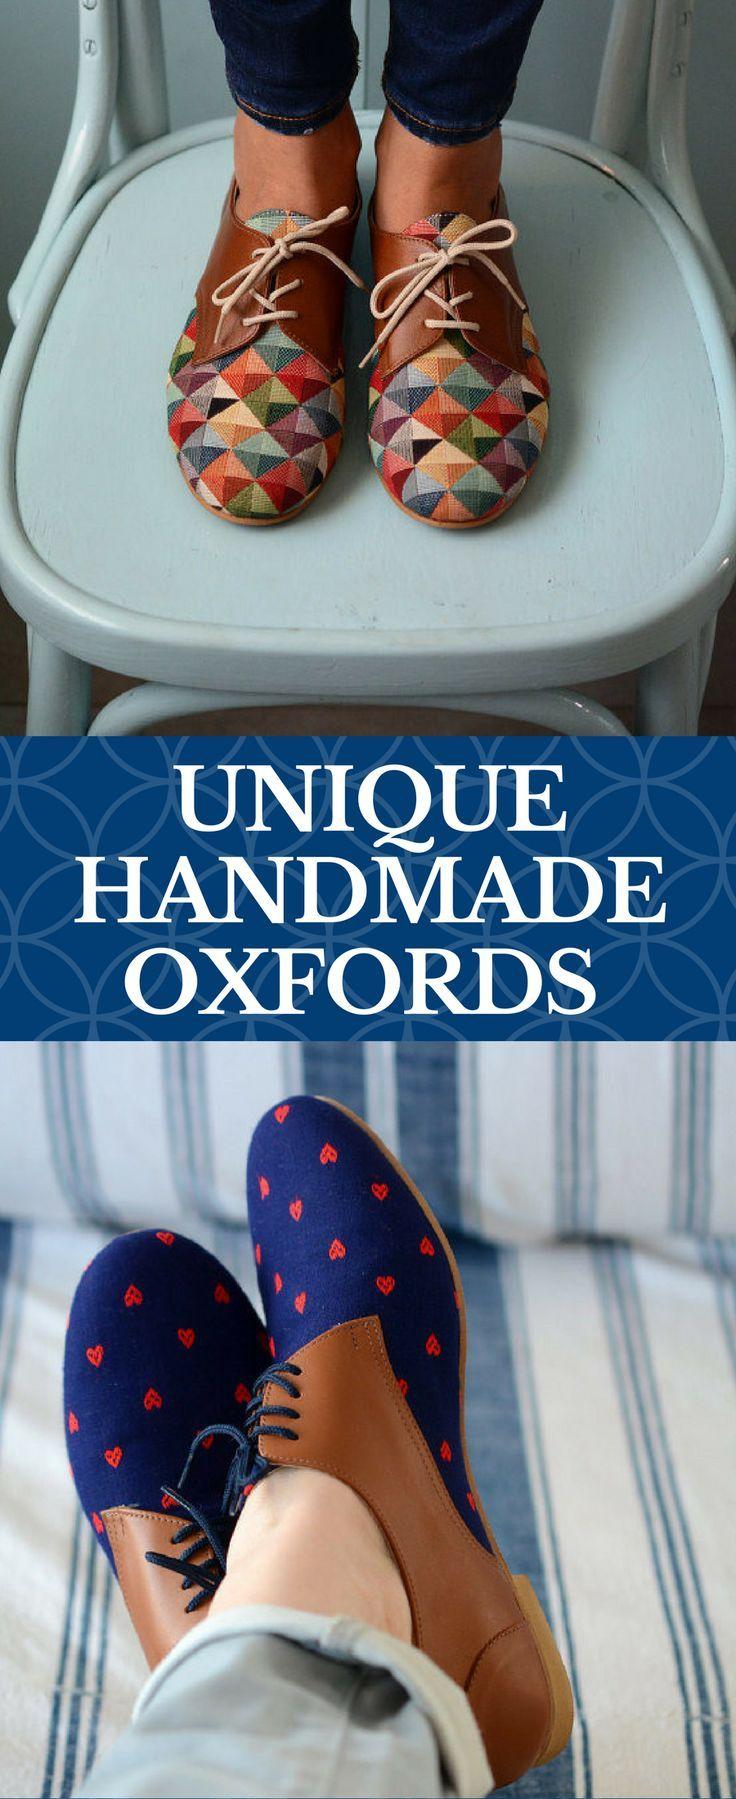 These handmade oxfords are so amazing! #handmade #vintage #retro ...